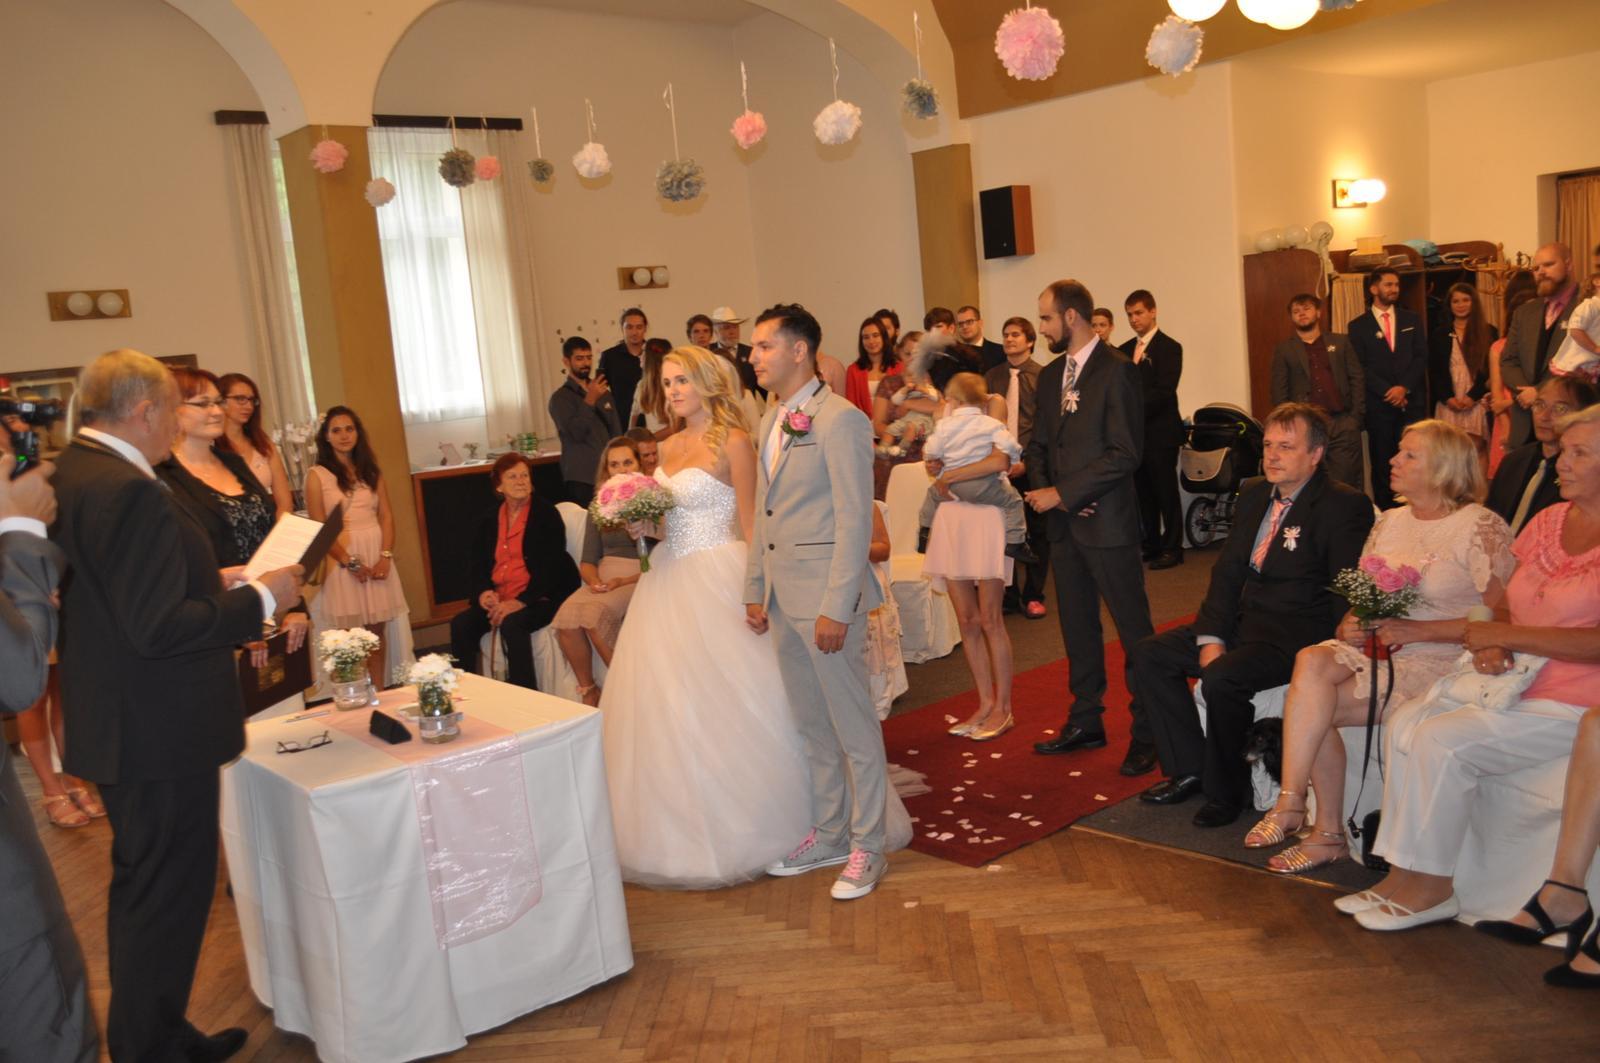 Svatby 2017 - mokrá varianta obřadu